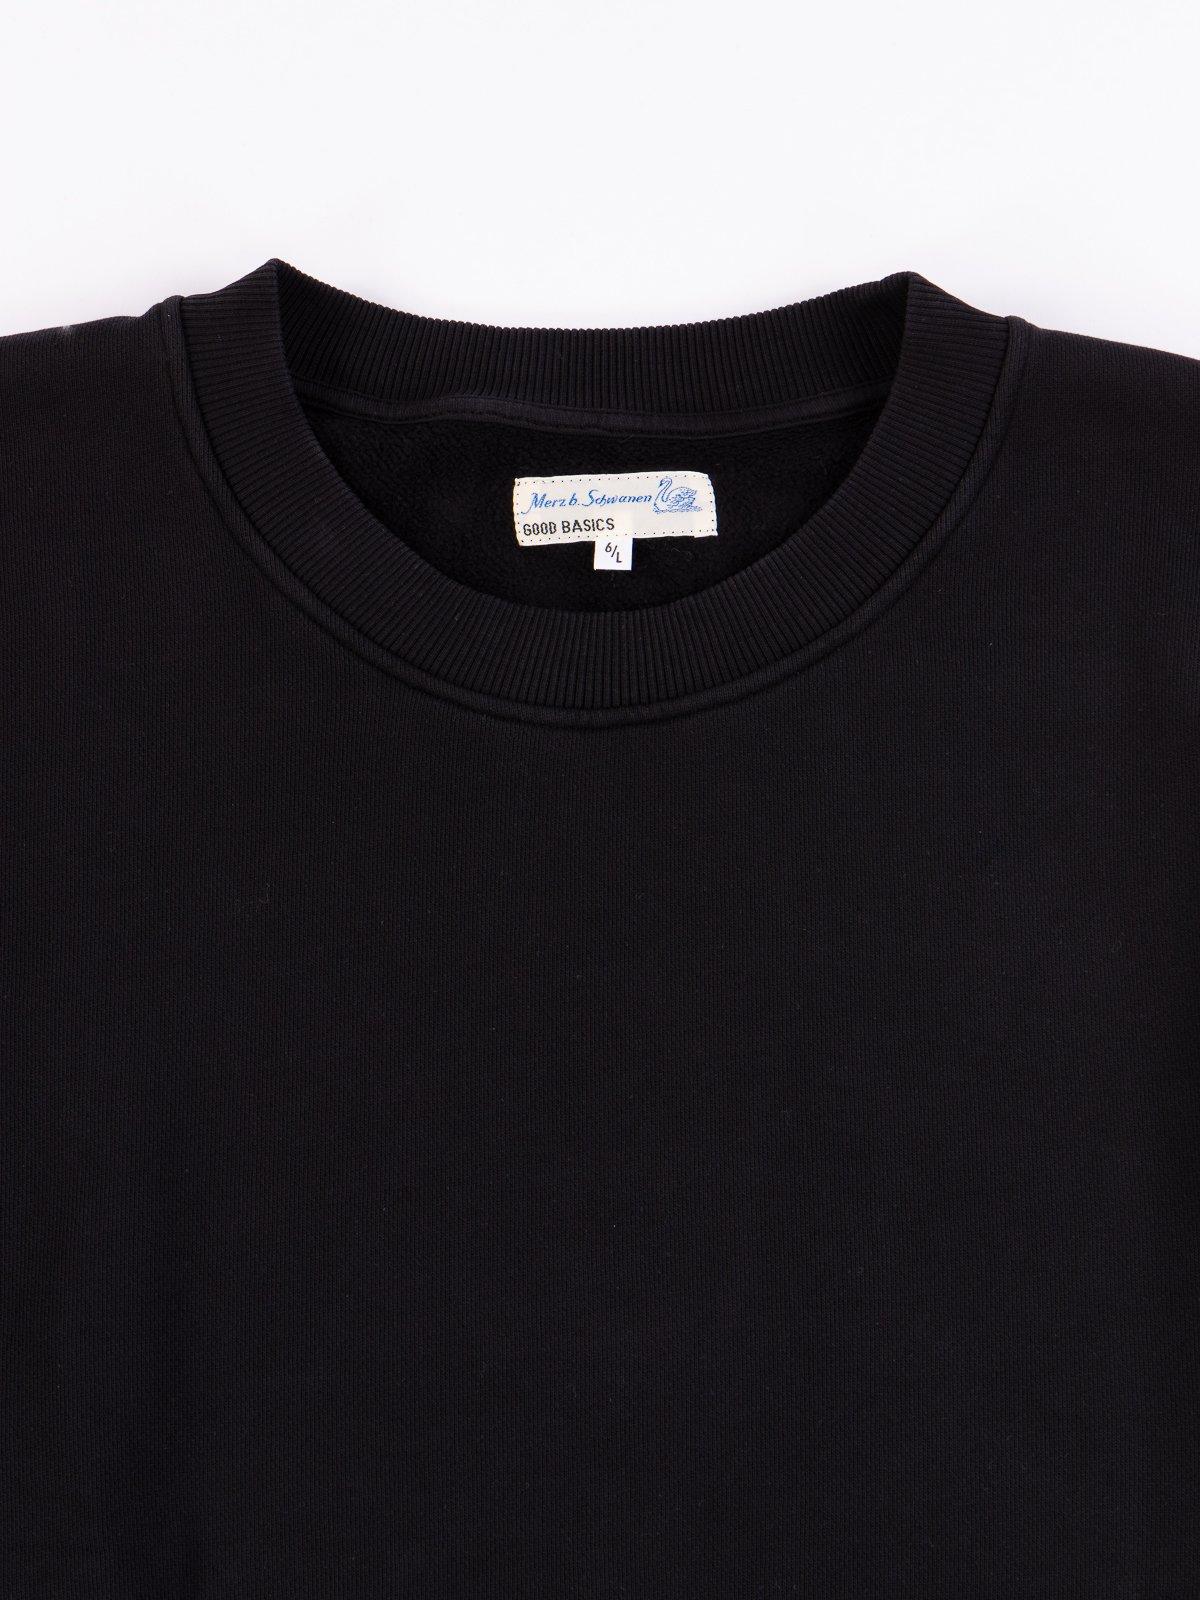 Deep Black Good Basics CSWOS01 Oversized Crew Neck Sweater - Image 3